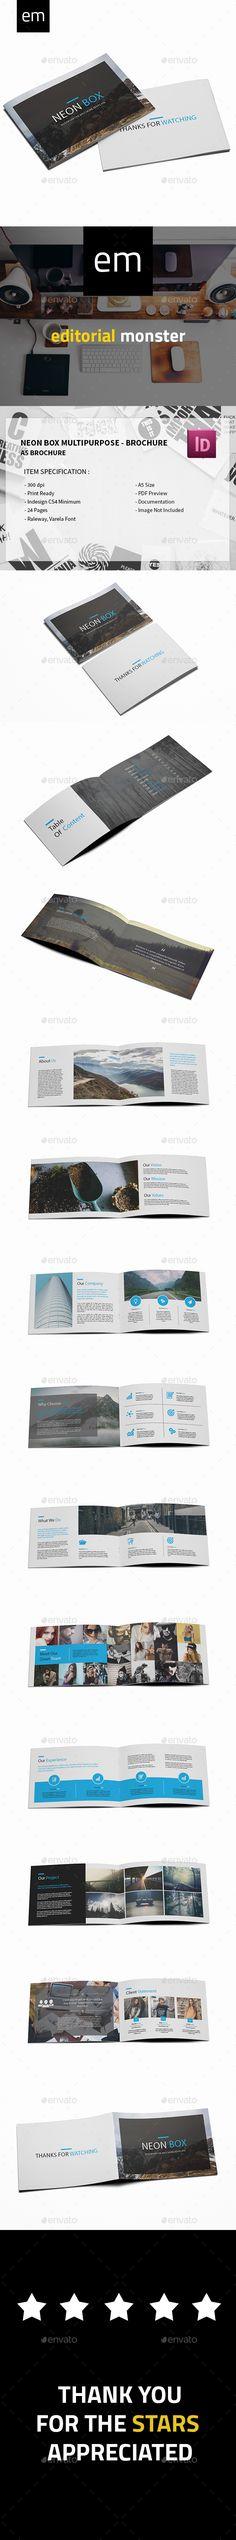 Neon Box - Corporate Multipurpose Brochure Template InDesign INDD